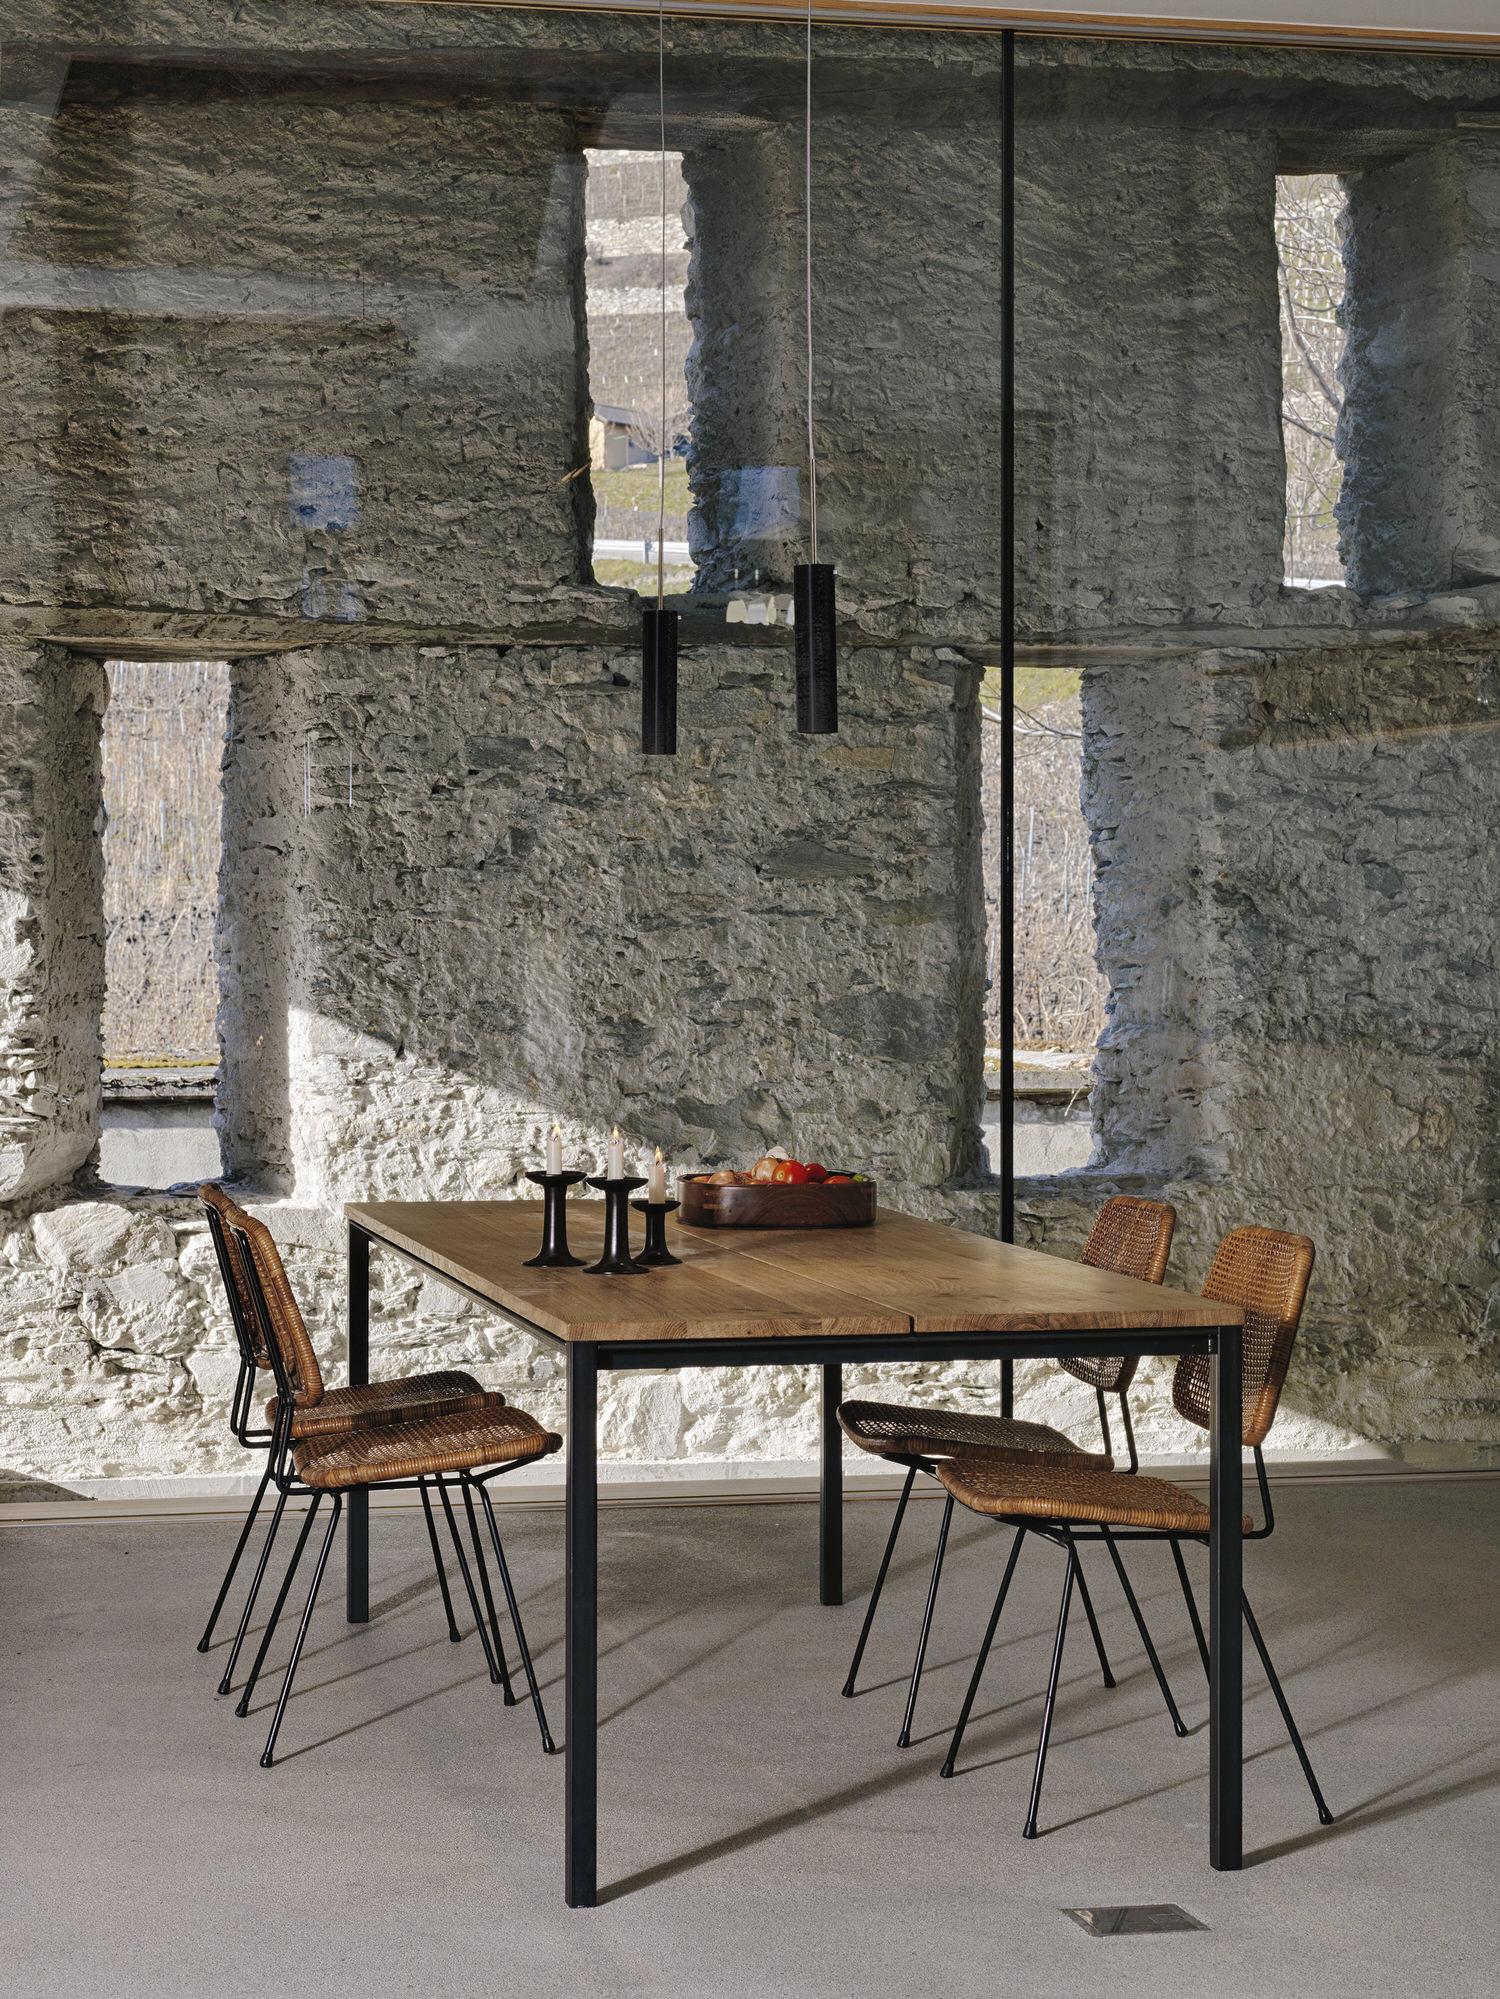 Ralph Germann Architectes House Ccb Valais Switzerland Photo Lionel Henriod Yellowtrace 03